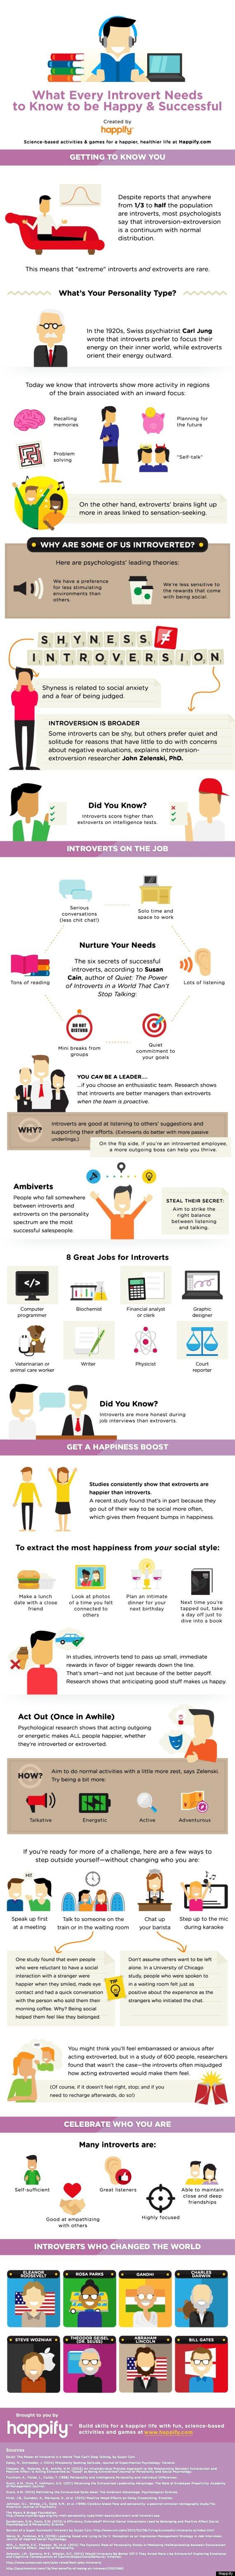 introverts happy